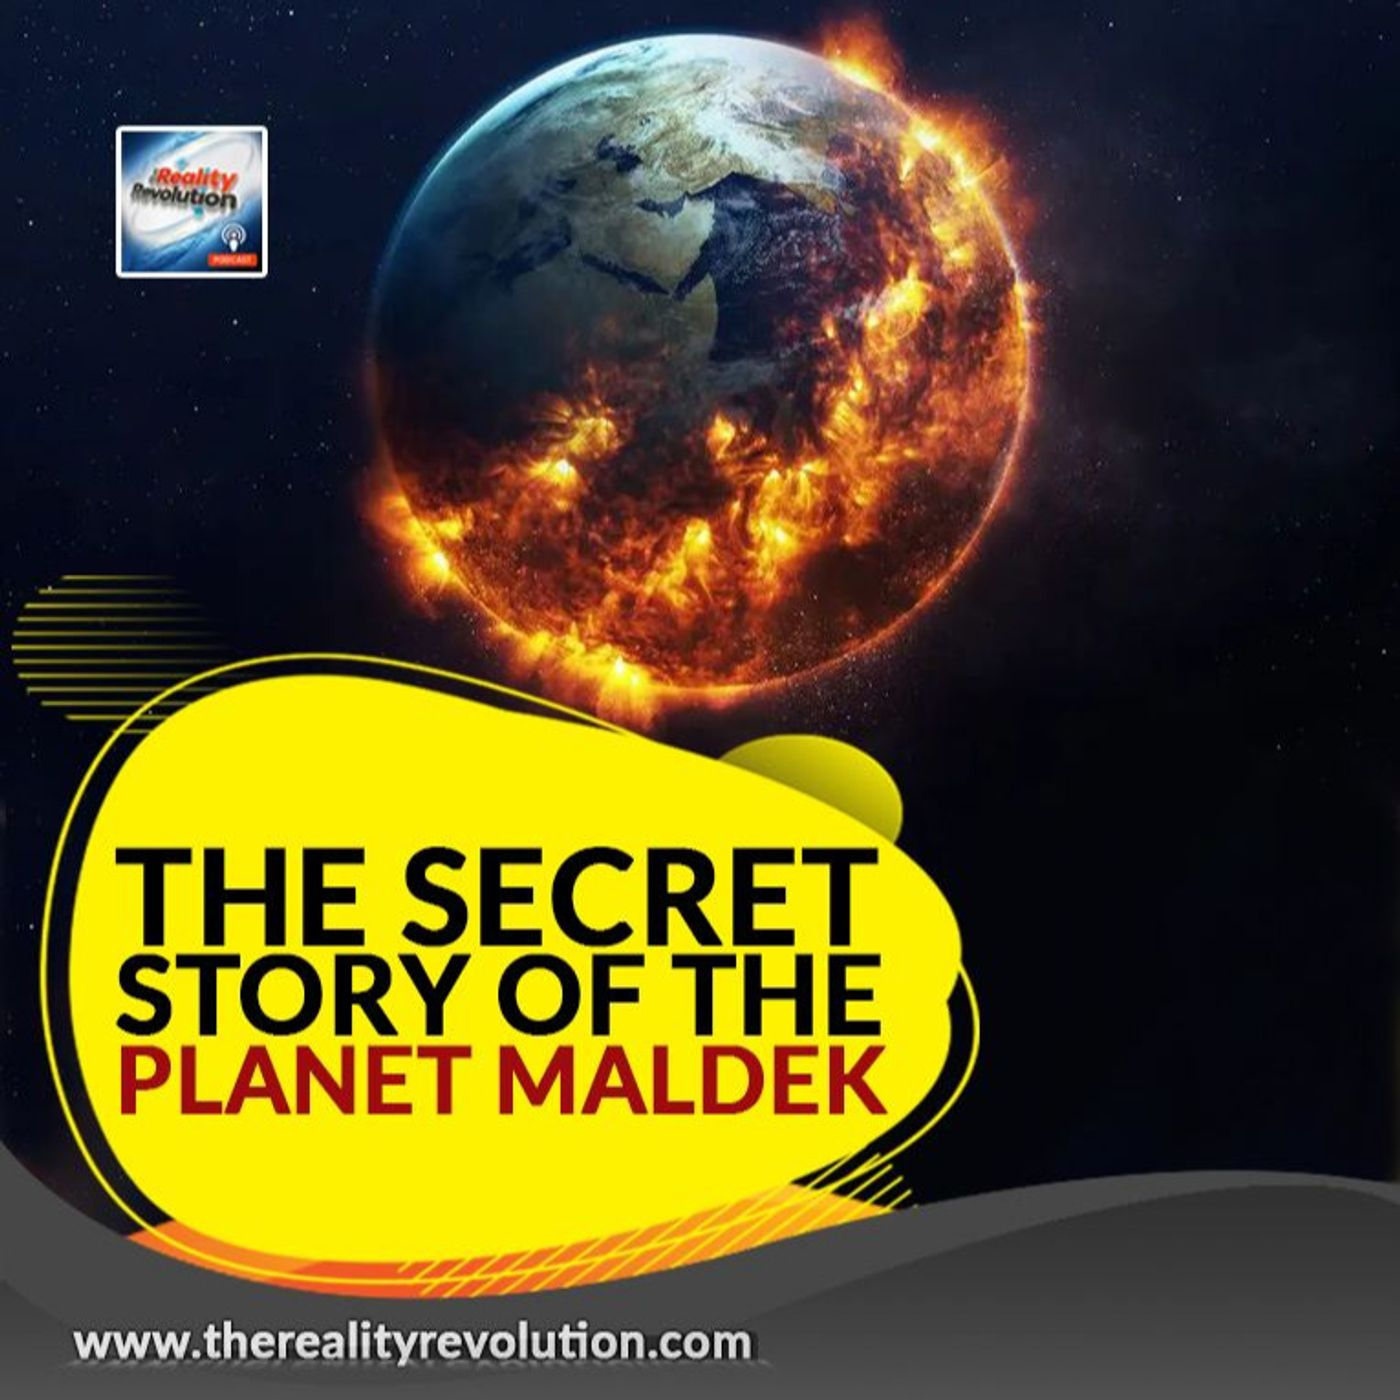 The Secret Story Of The Planet Maldek